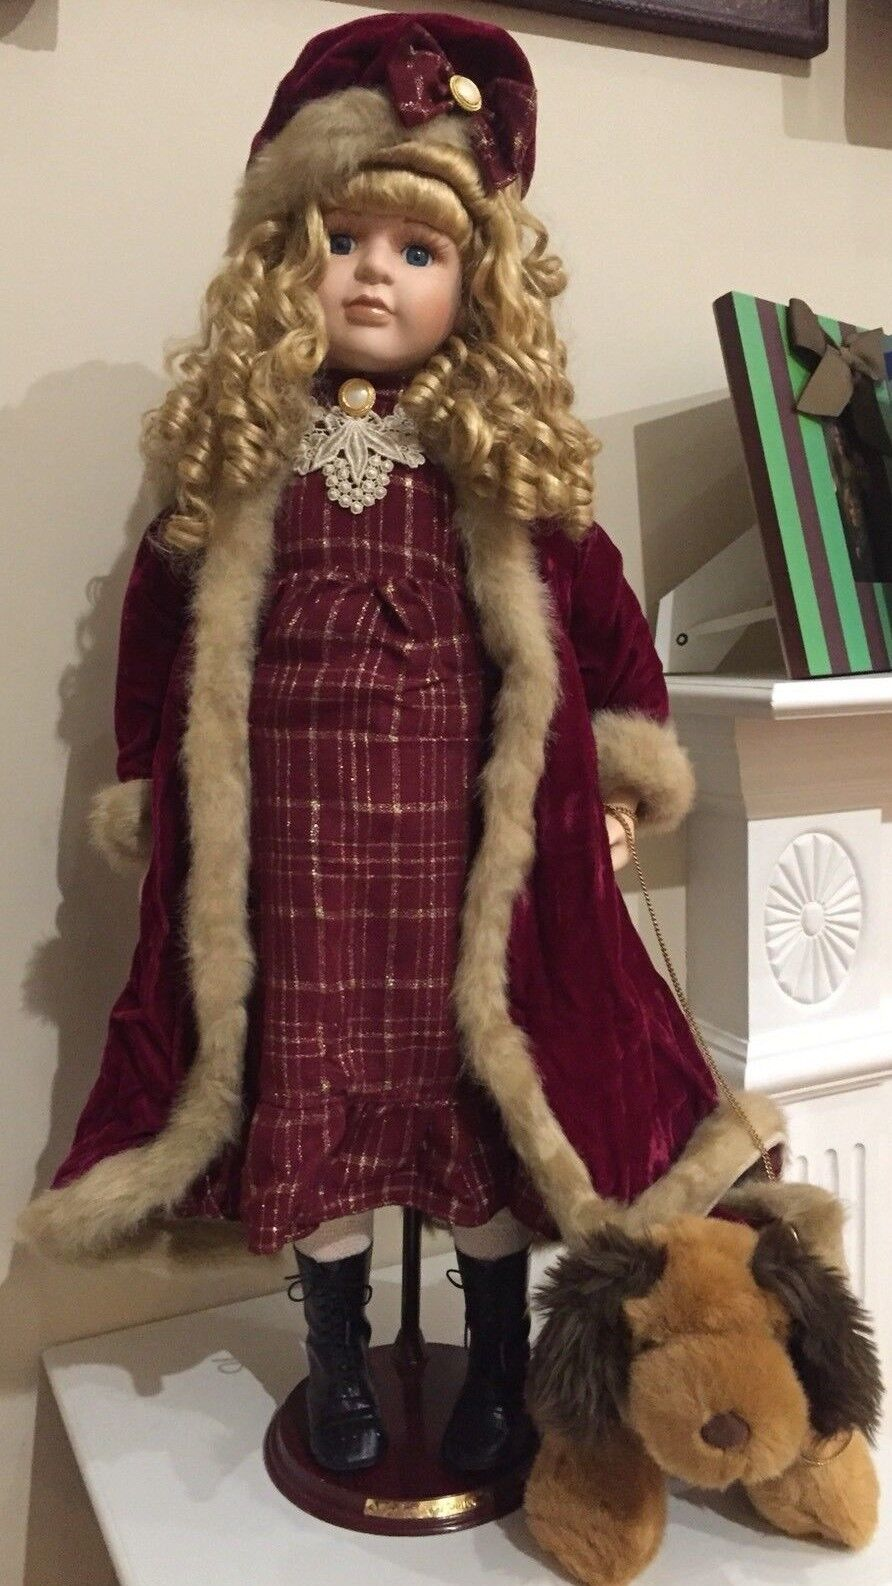 Ttutti Vintage Porcelain bambola With Doggie Collector's  choice by Dan Dee 31  ttutti   fabbrica diretta